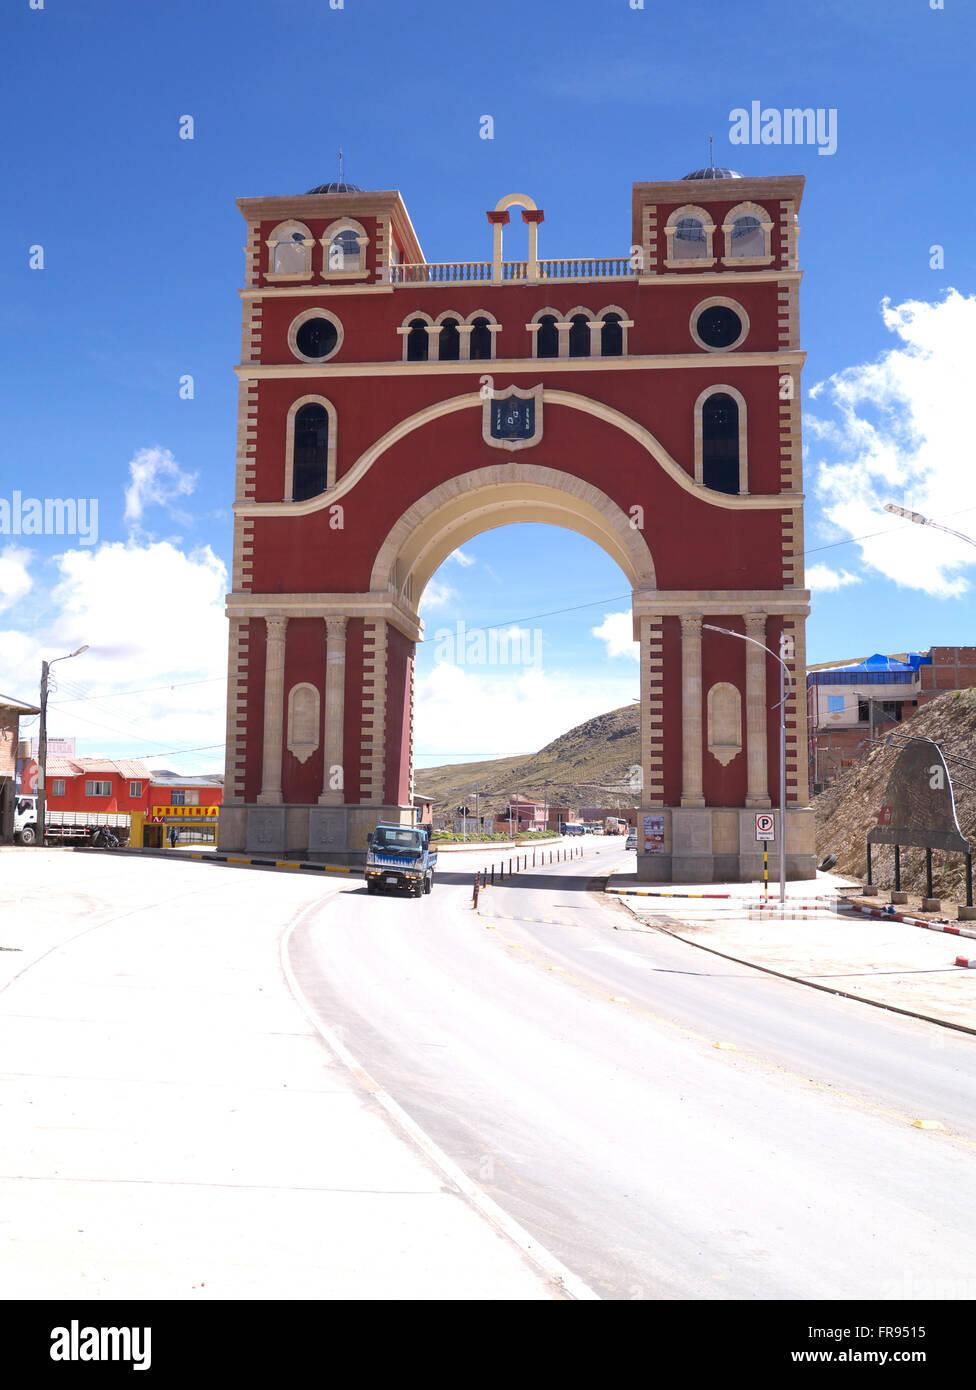 Entrance gate to Potosi, Bolivia - Stock Image